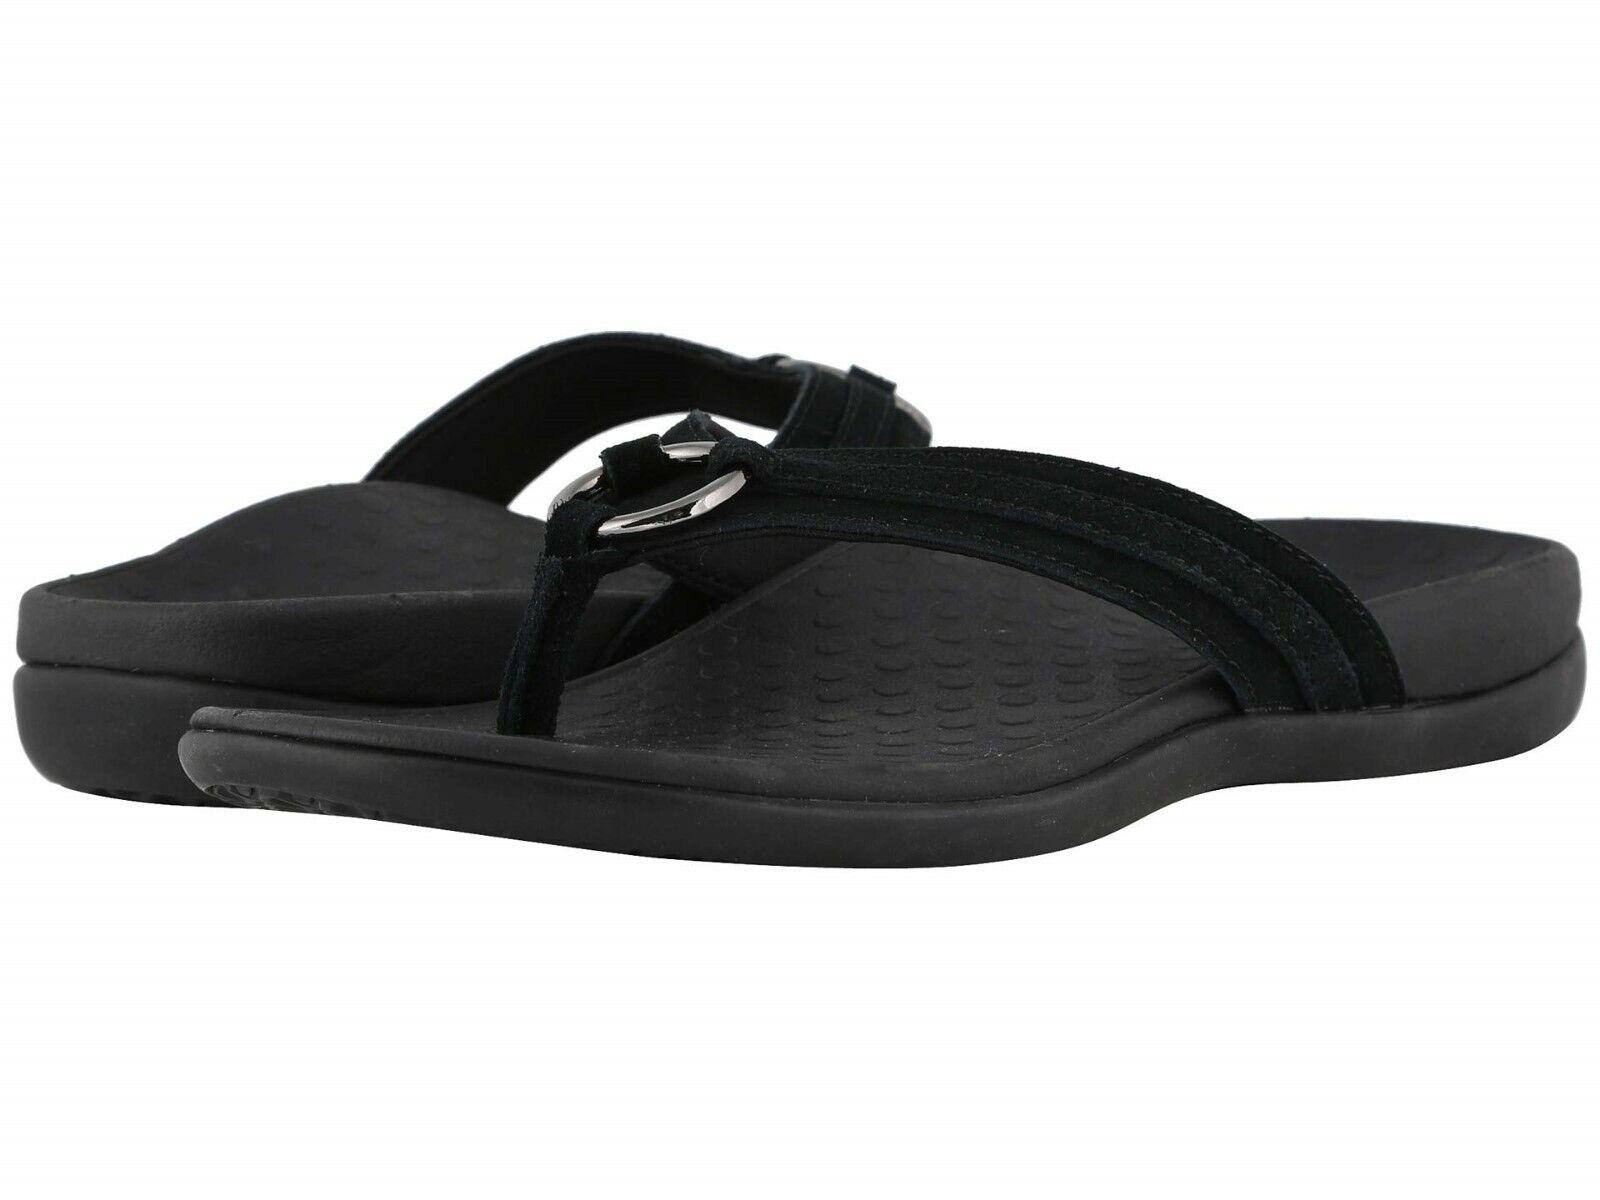 NEW WOMEN 2019 VIONIC TIDE ALOE BLACK FASHION SANDALS SLIP ON COMFORT ORIGINAL